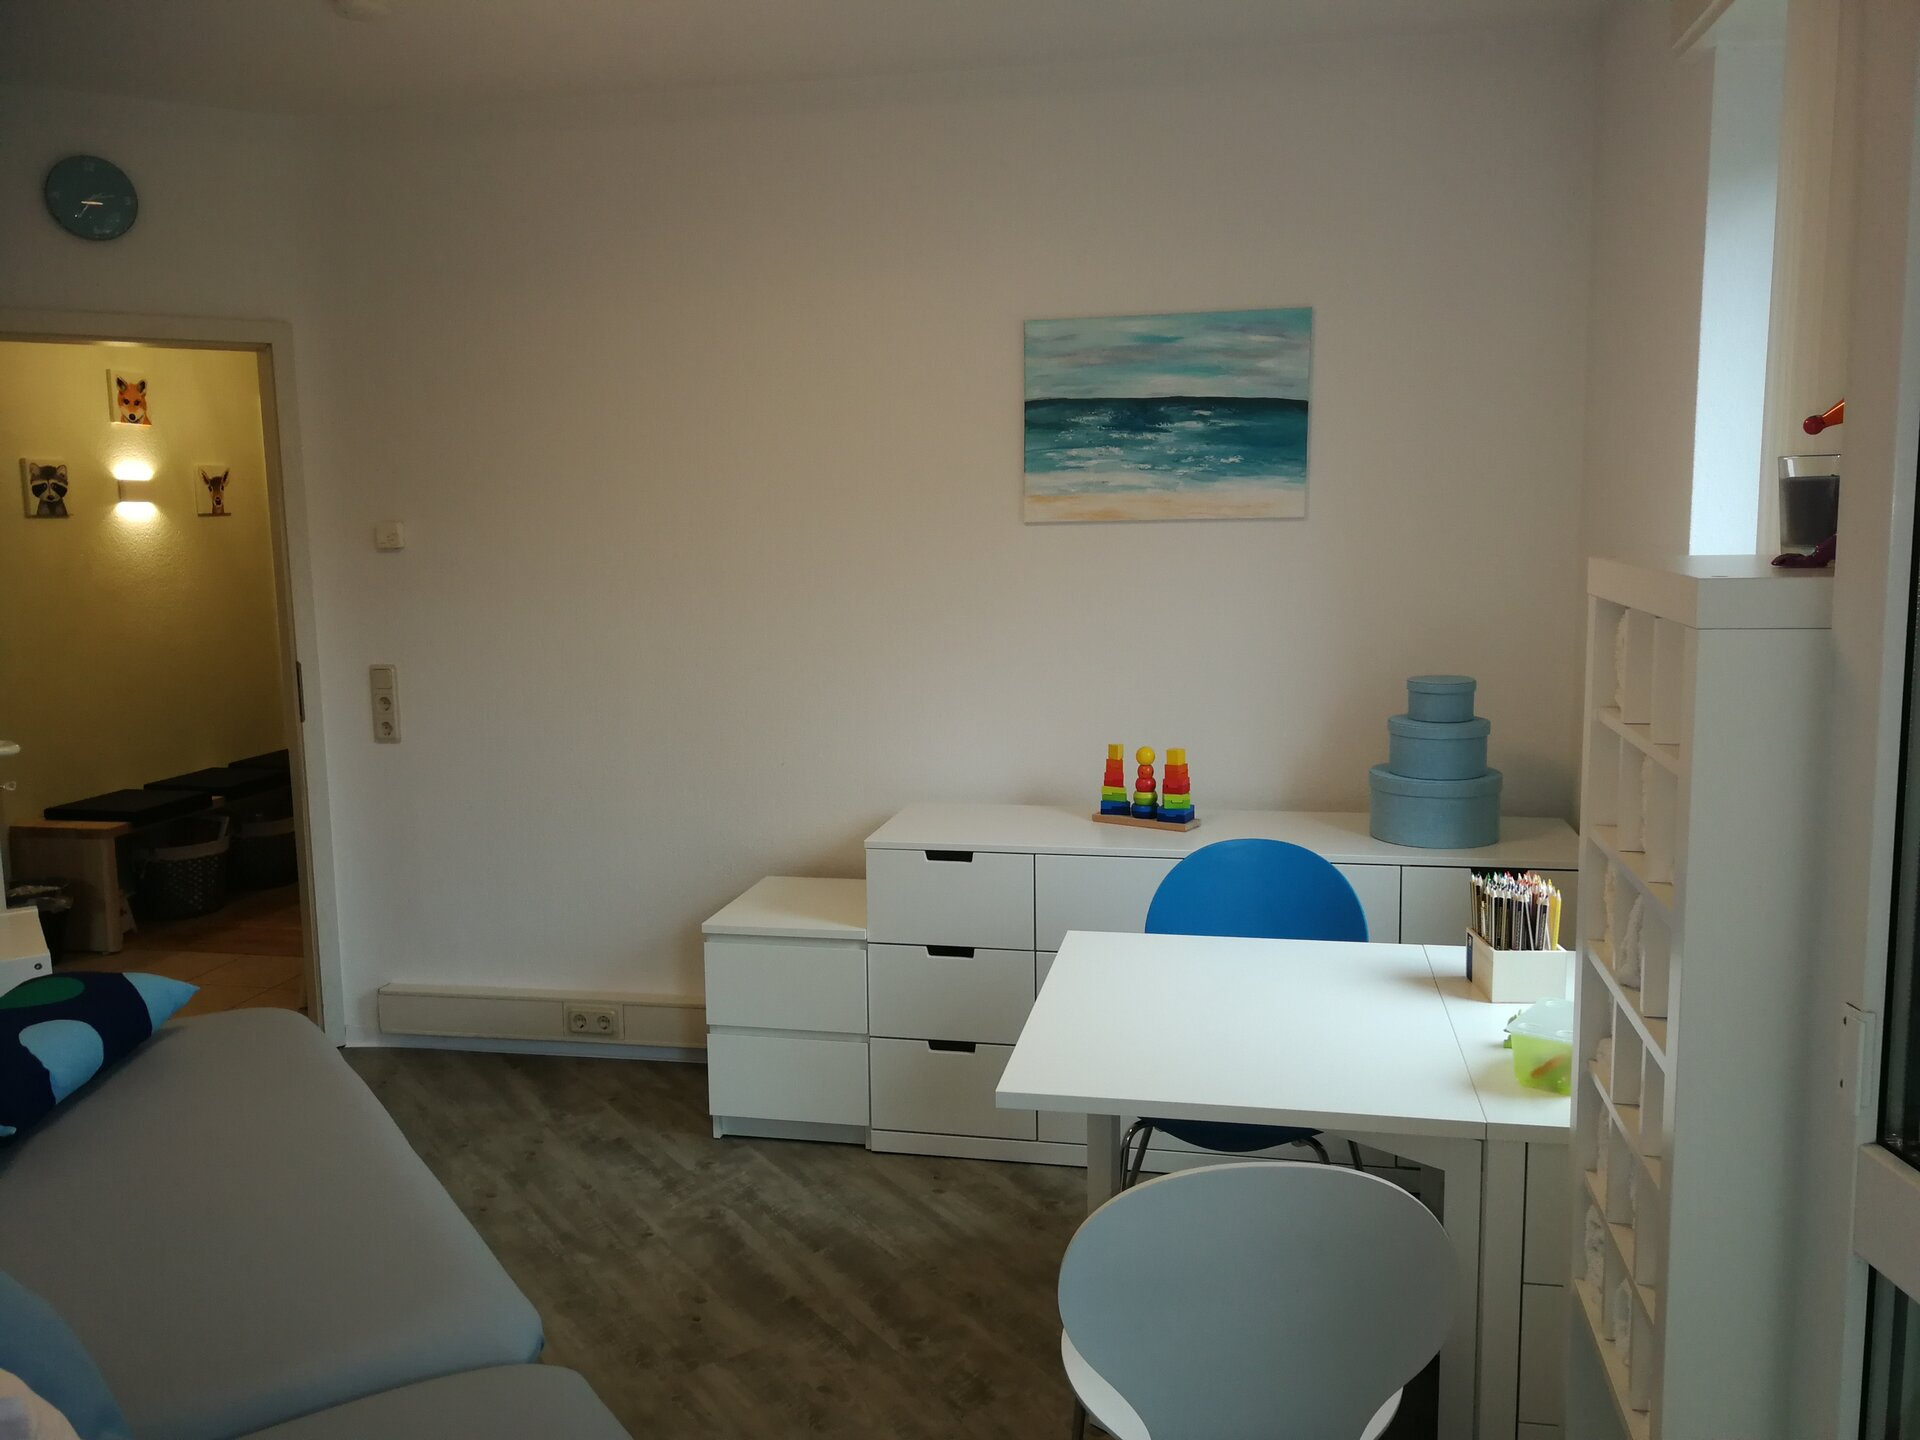 Therapieraum 2: Neurologieraum / Hirnleistungstraining